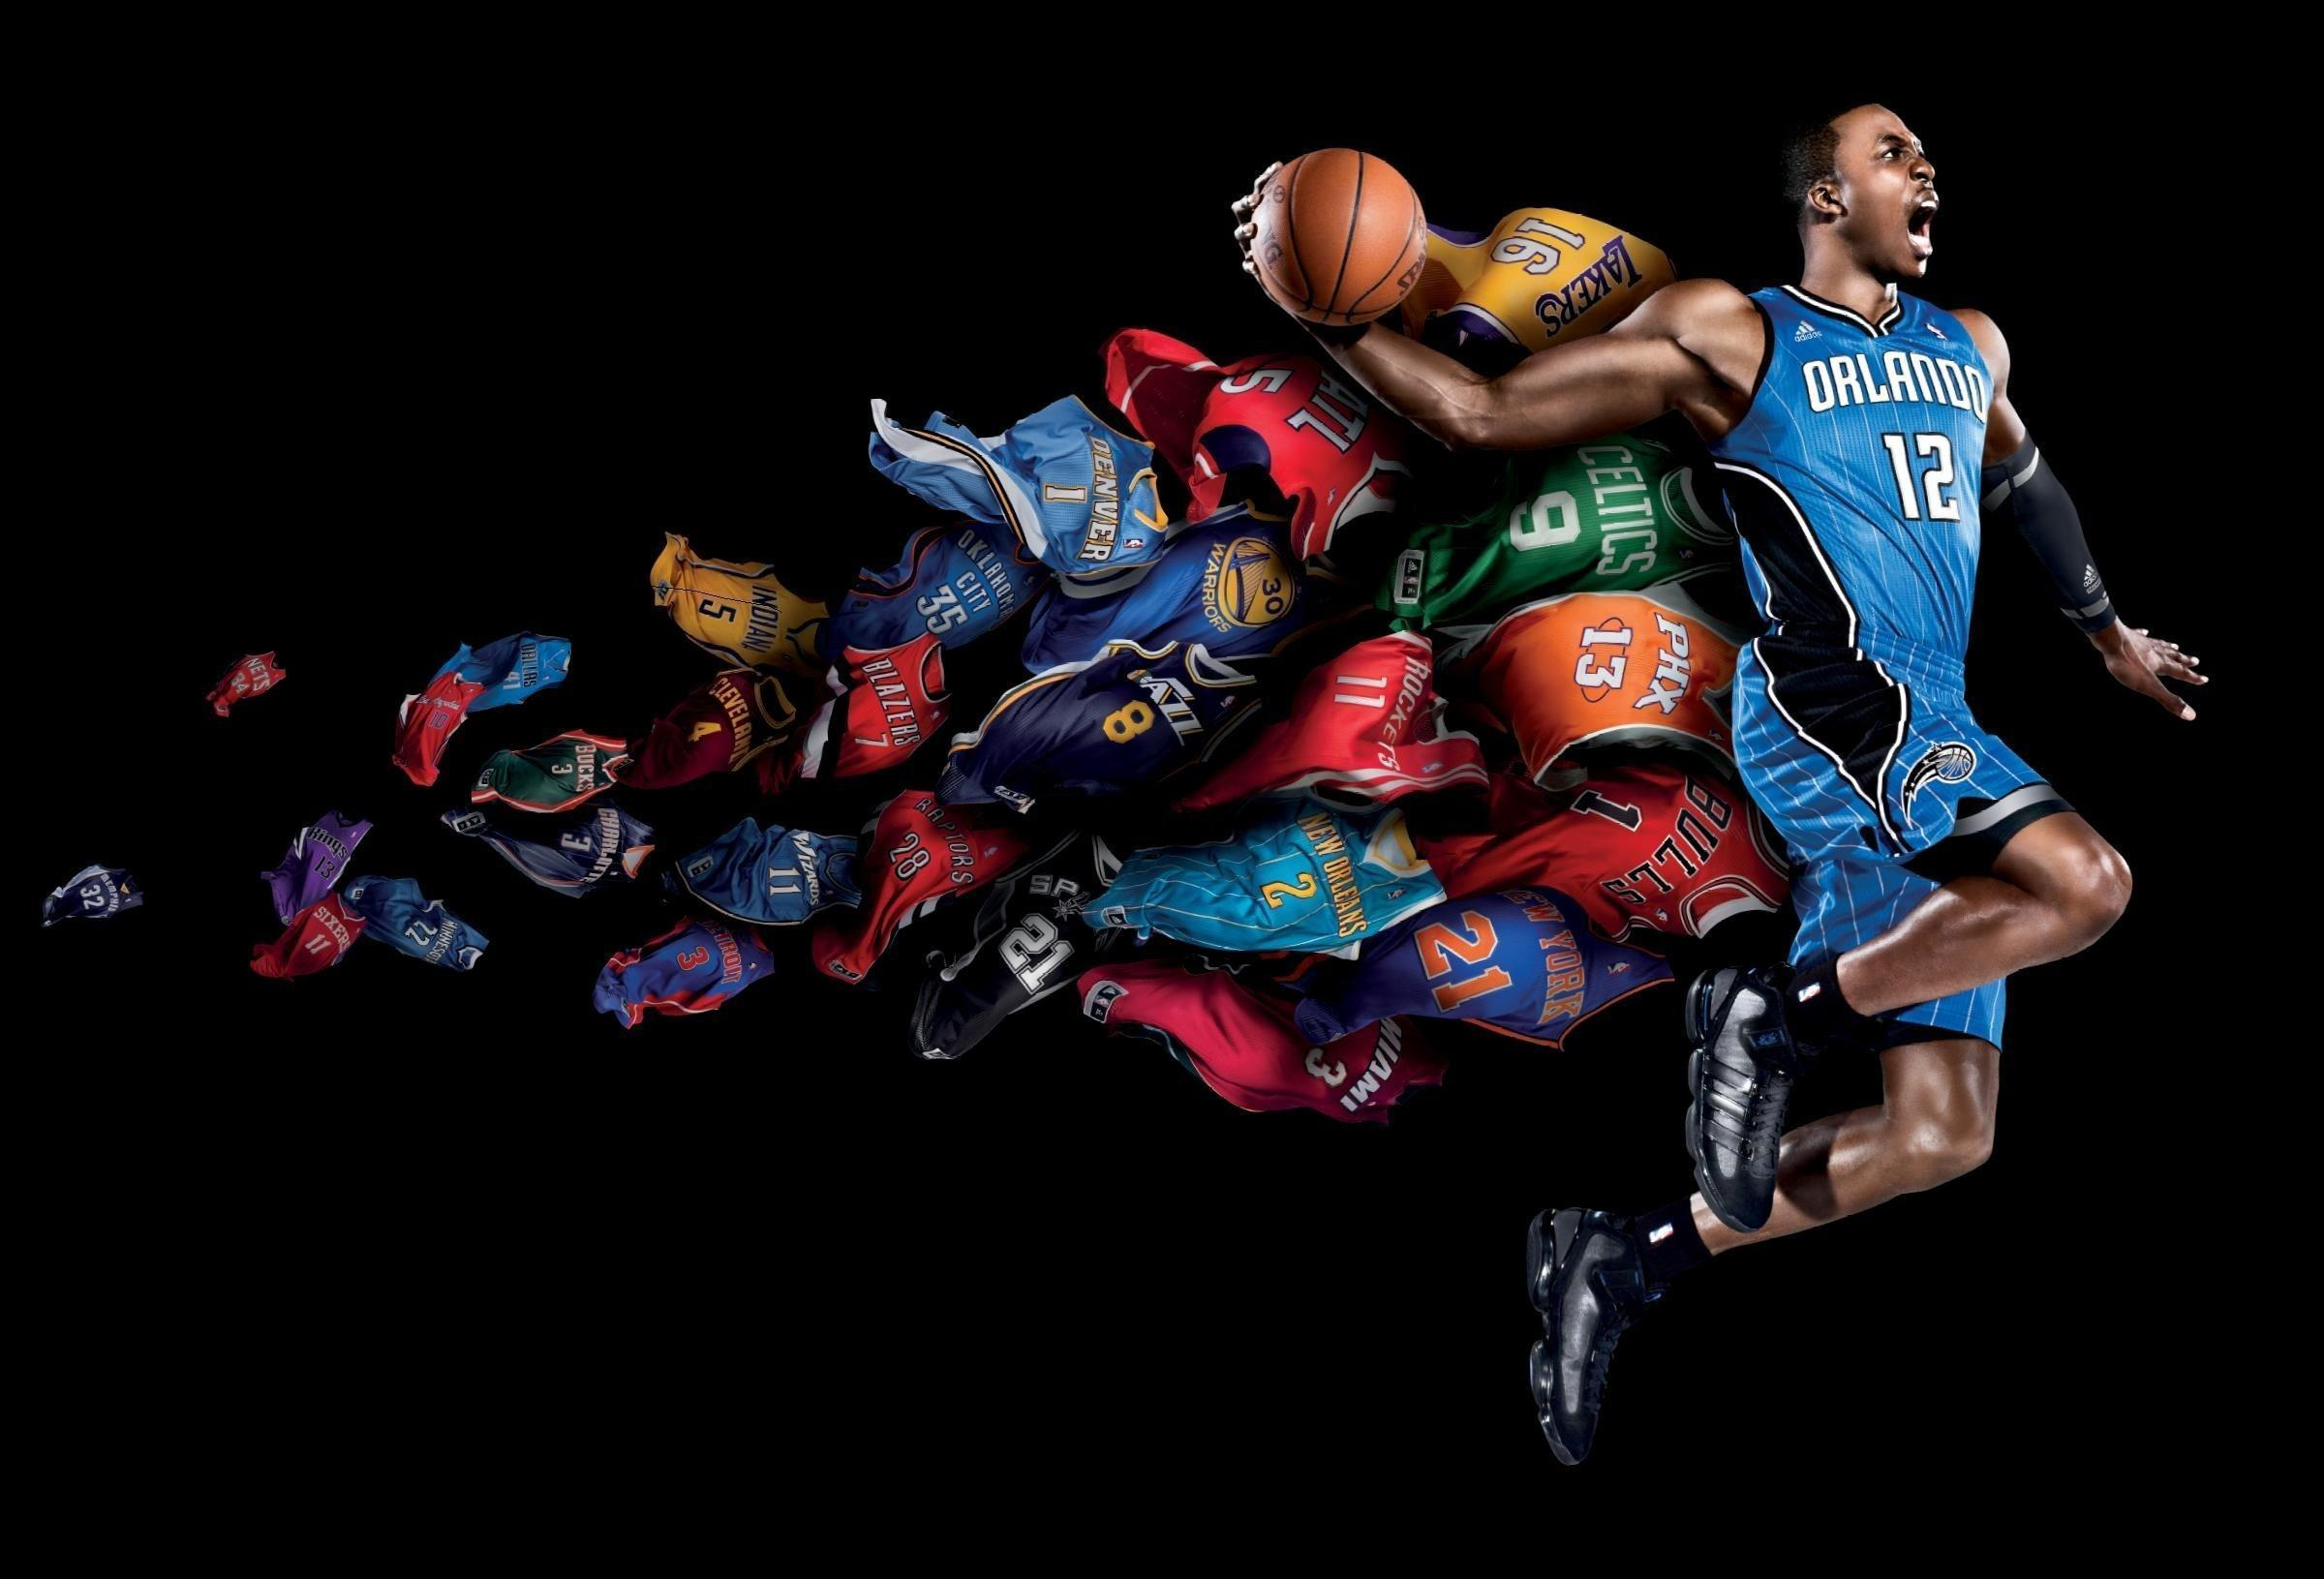 awesome basketball wallpapers unpixelated - photo #29